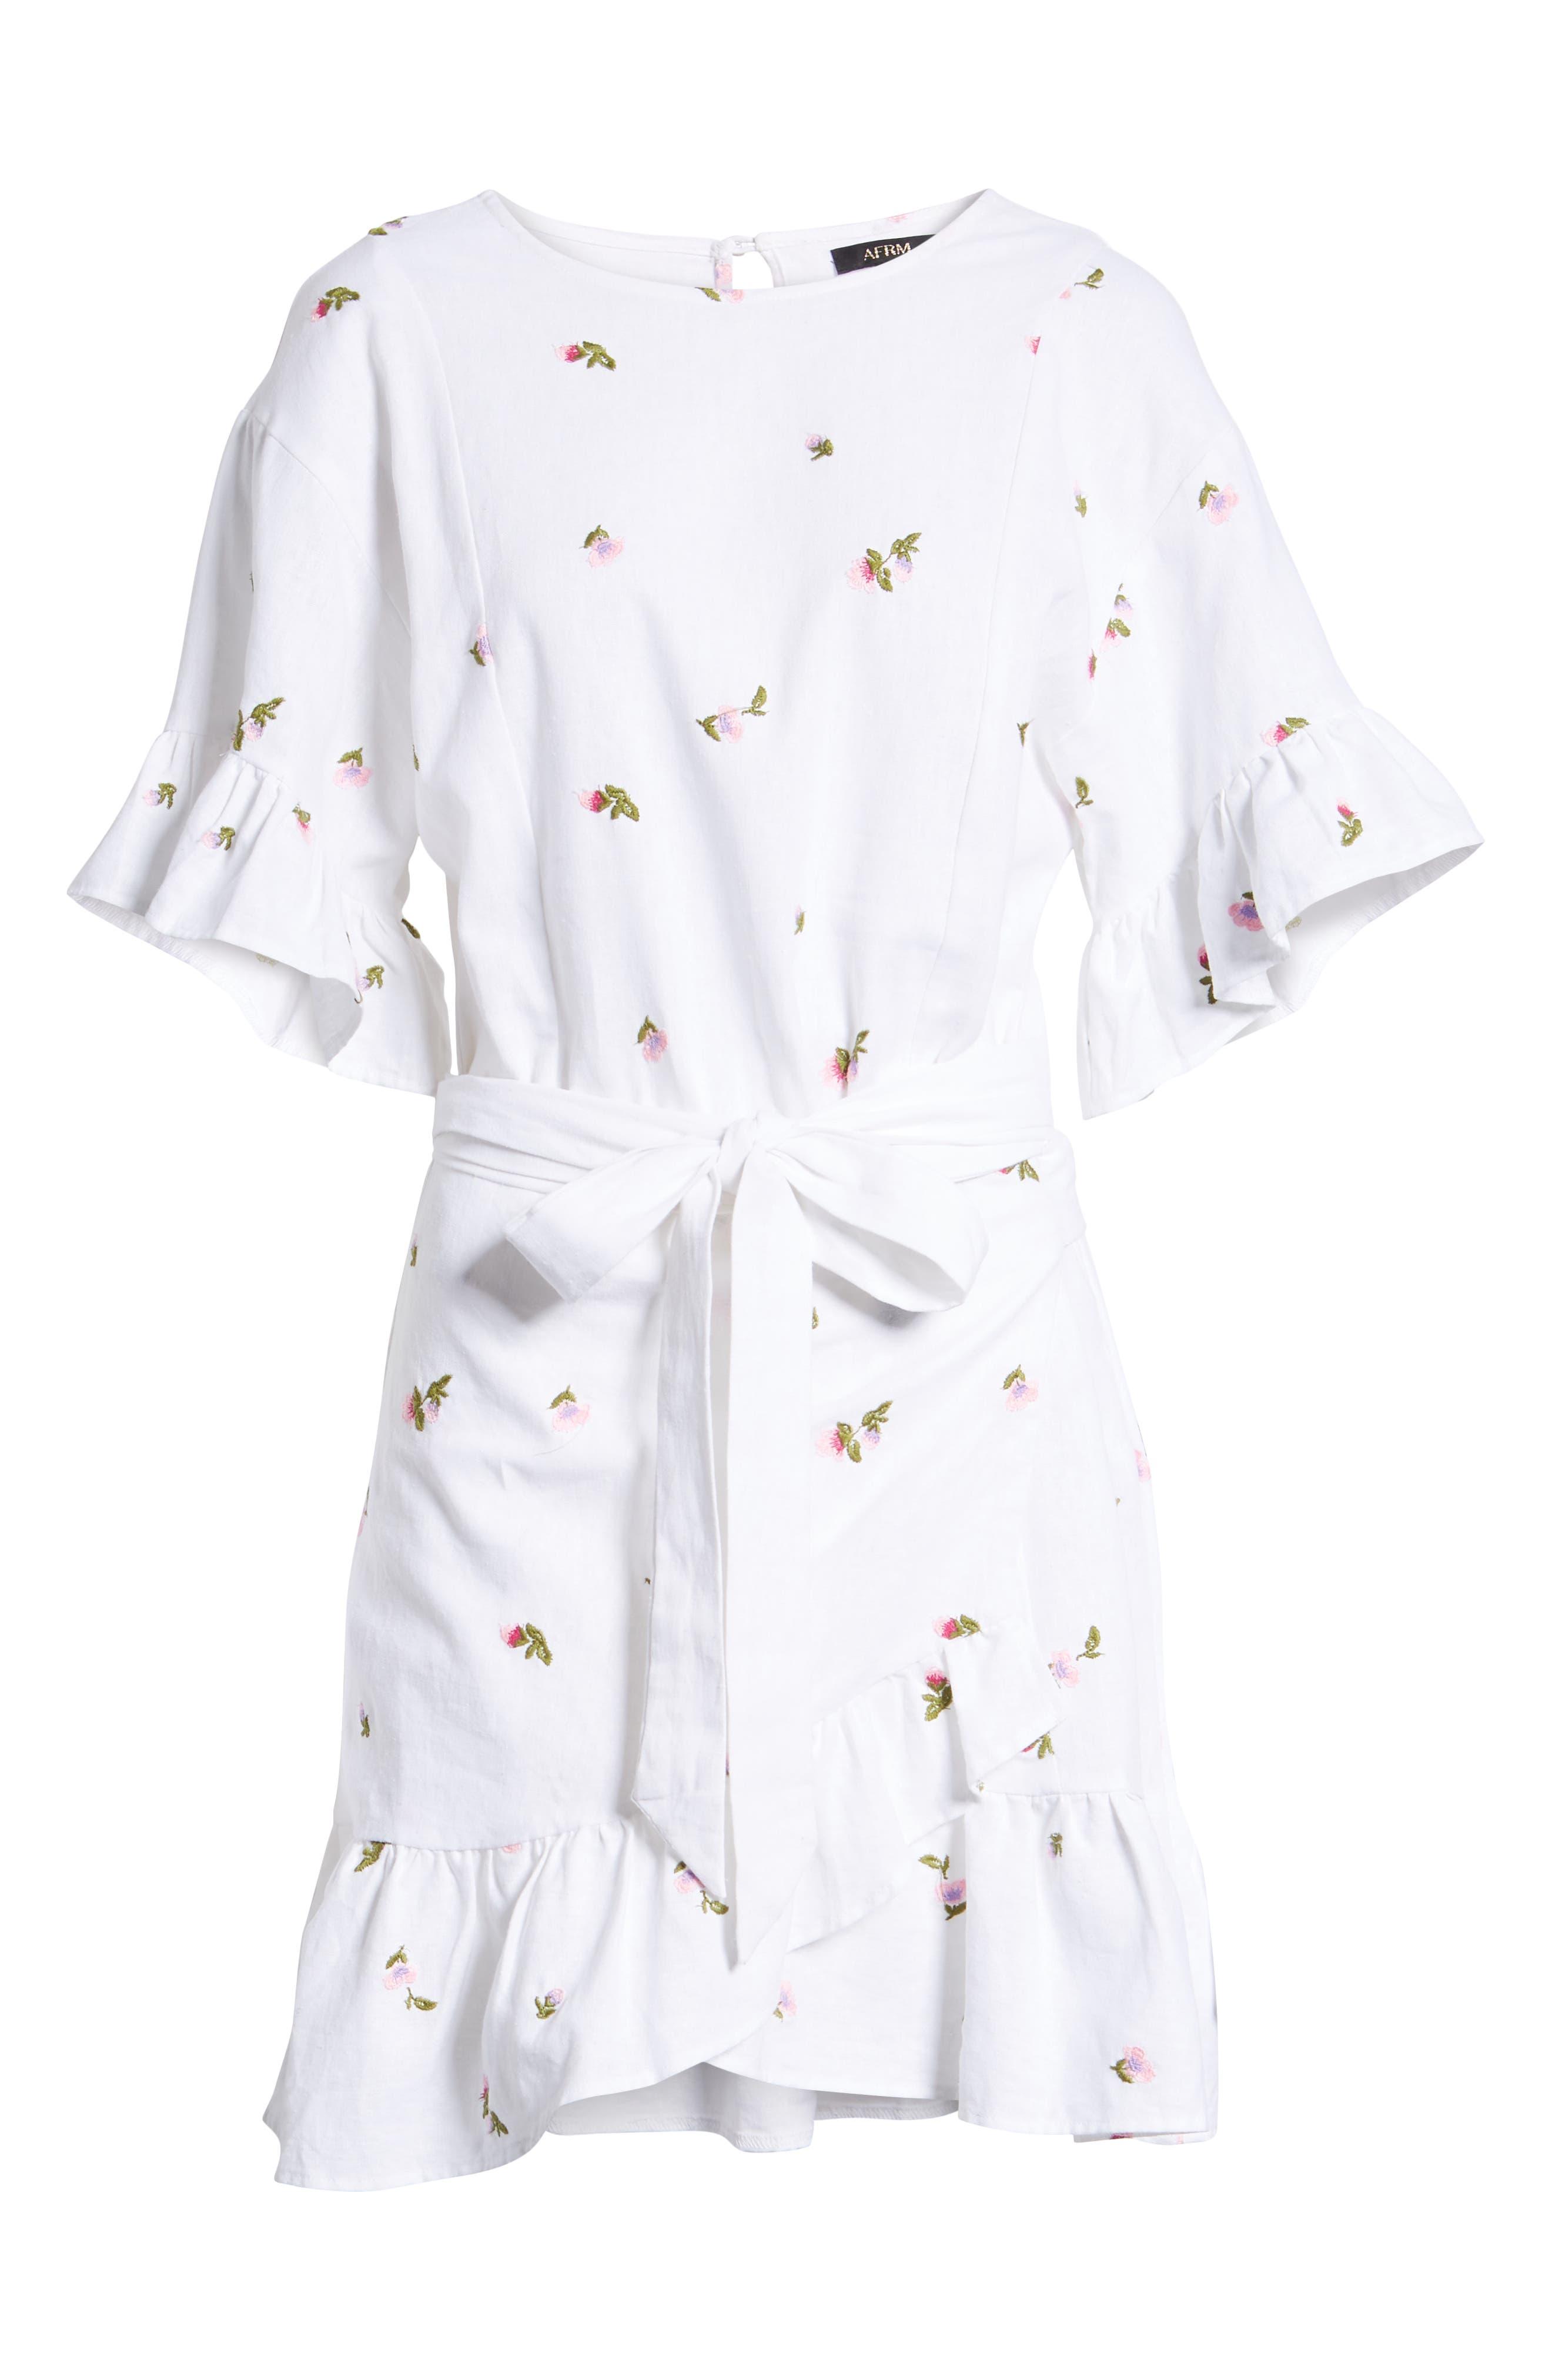 Tokyo Ruffle Sleeve Wrap Dress,                             Alternate thumbnail 7, color,                             DITSY EMBROIDERY